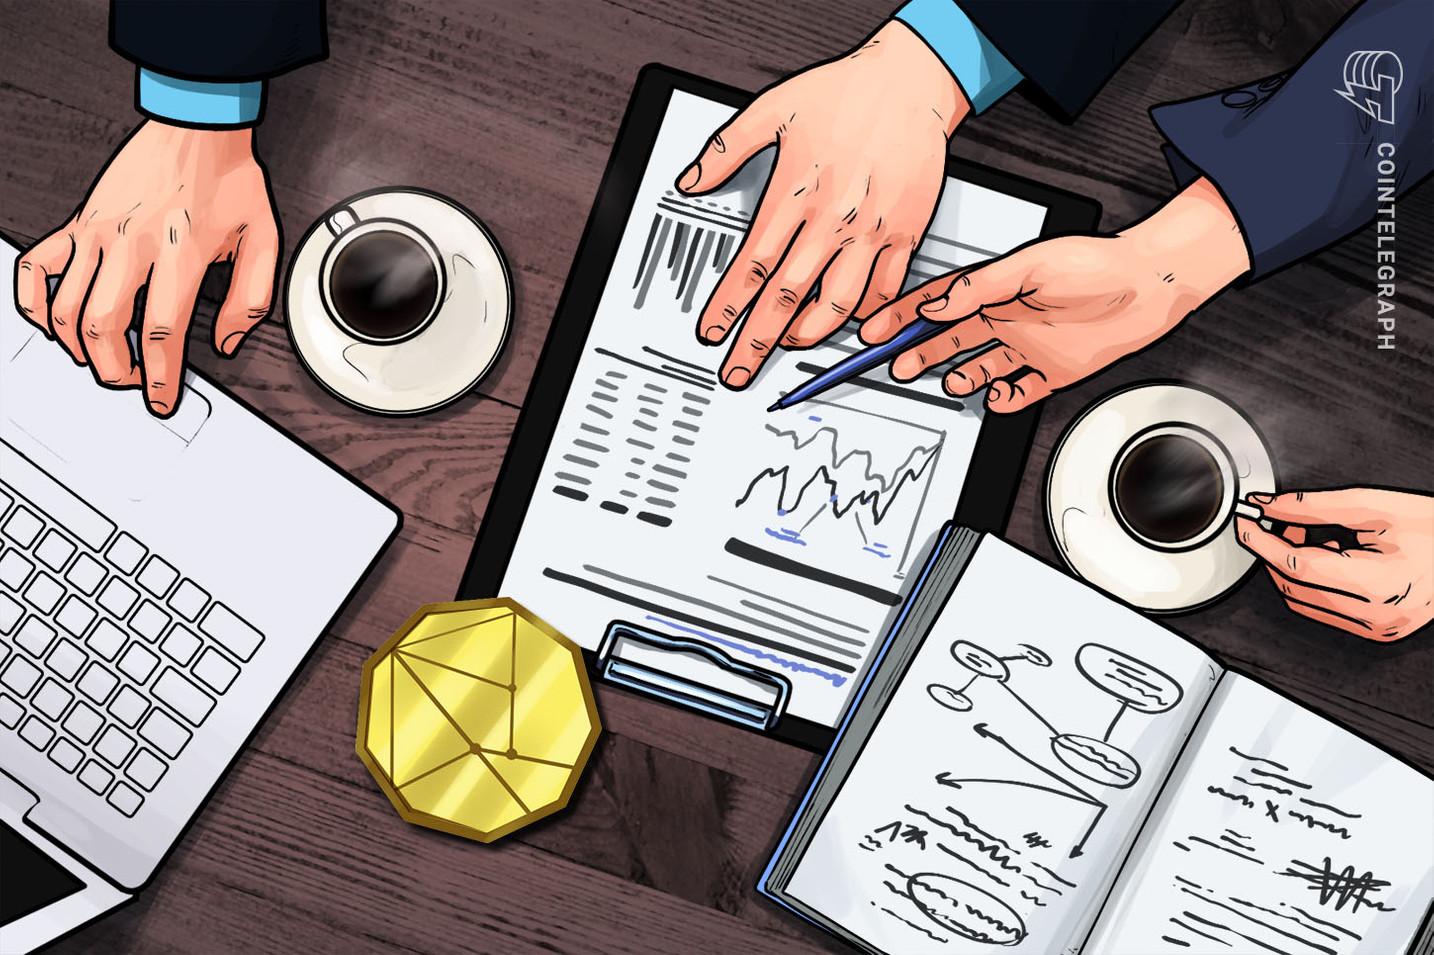 Daily Traded Volume on Huobi's Crypto Derivatives Platform Breaks $1 Billion